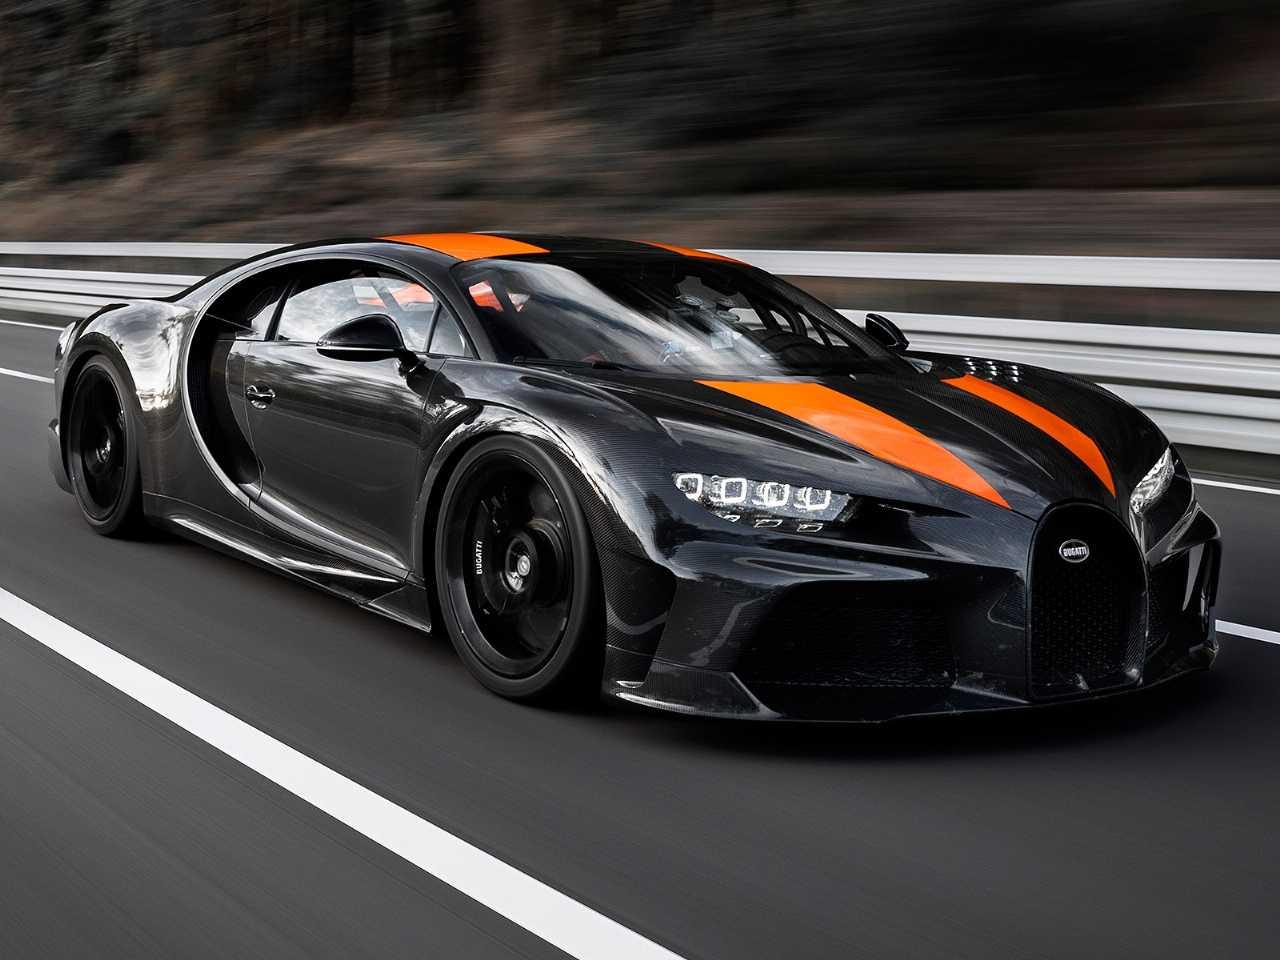 Acima o Bugatti Chiron que estabeleceu o novo recorde de velocidade para automóveis